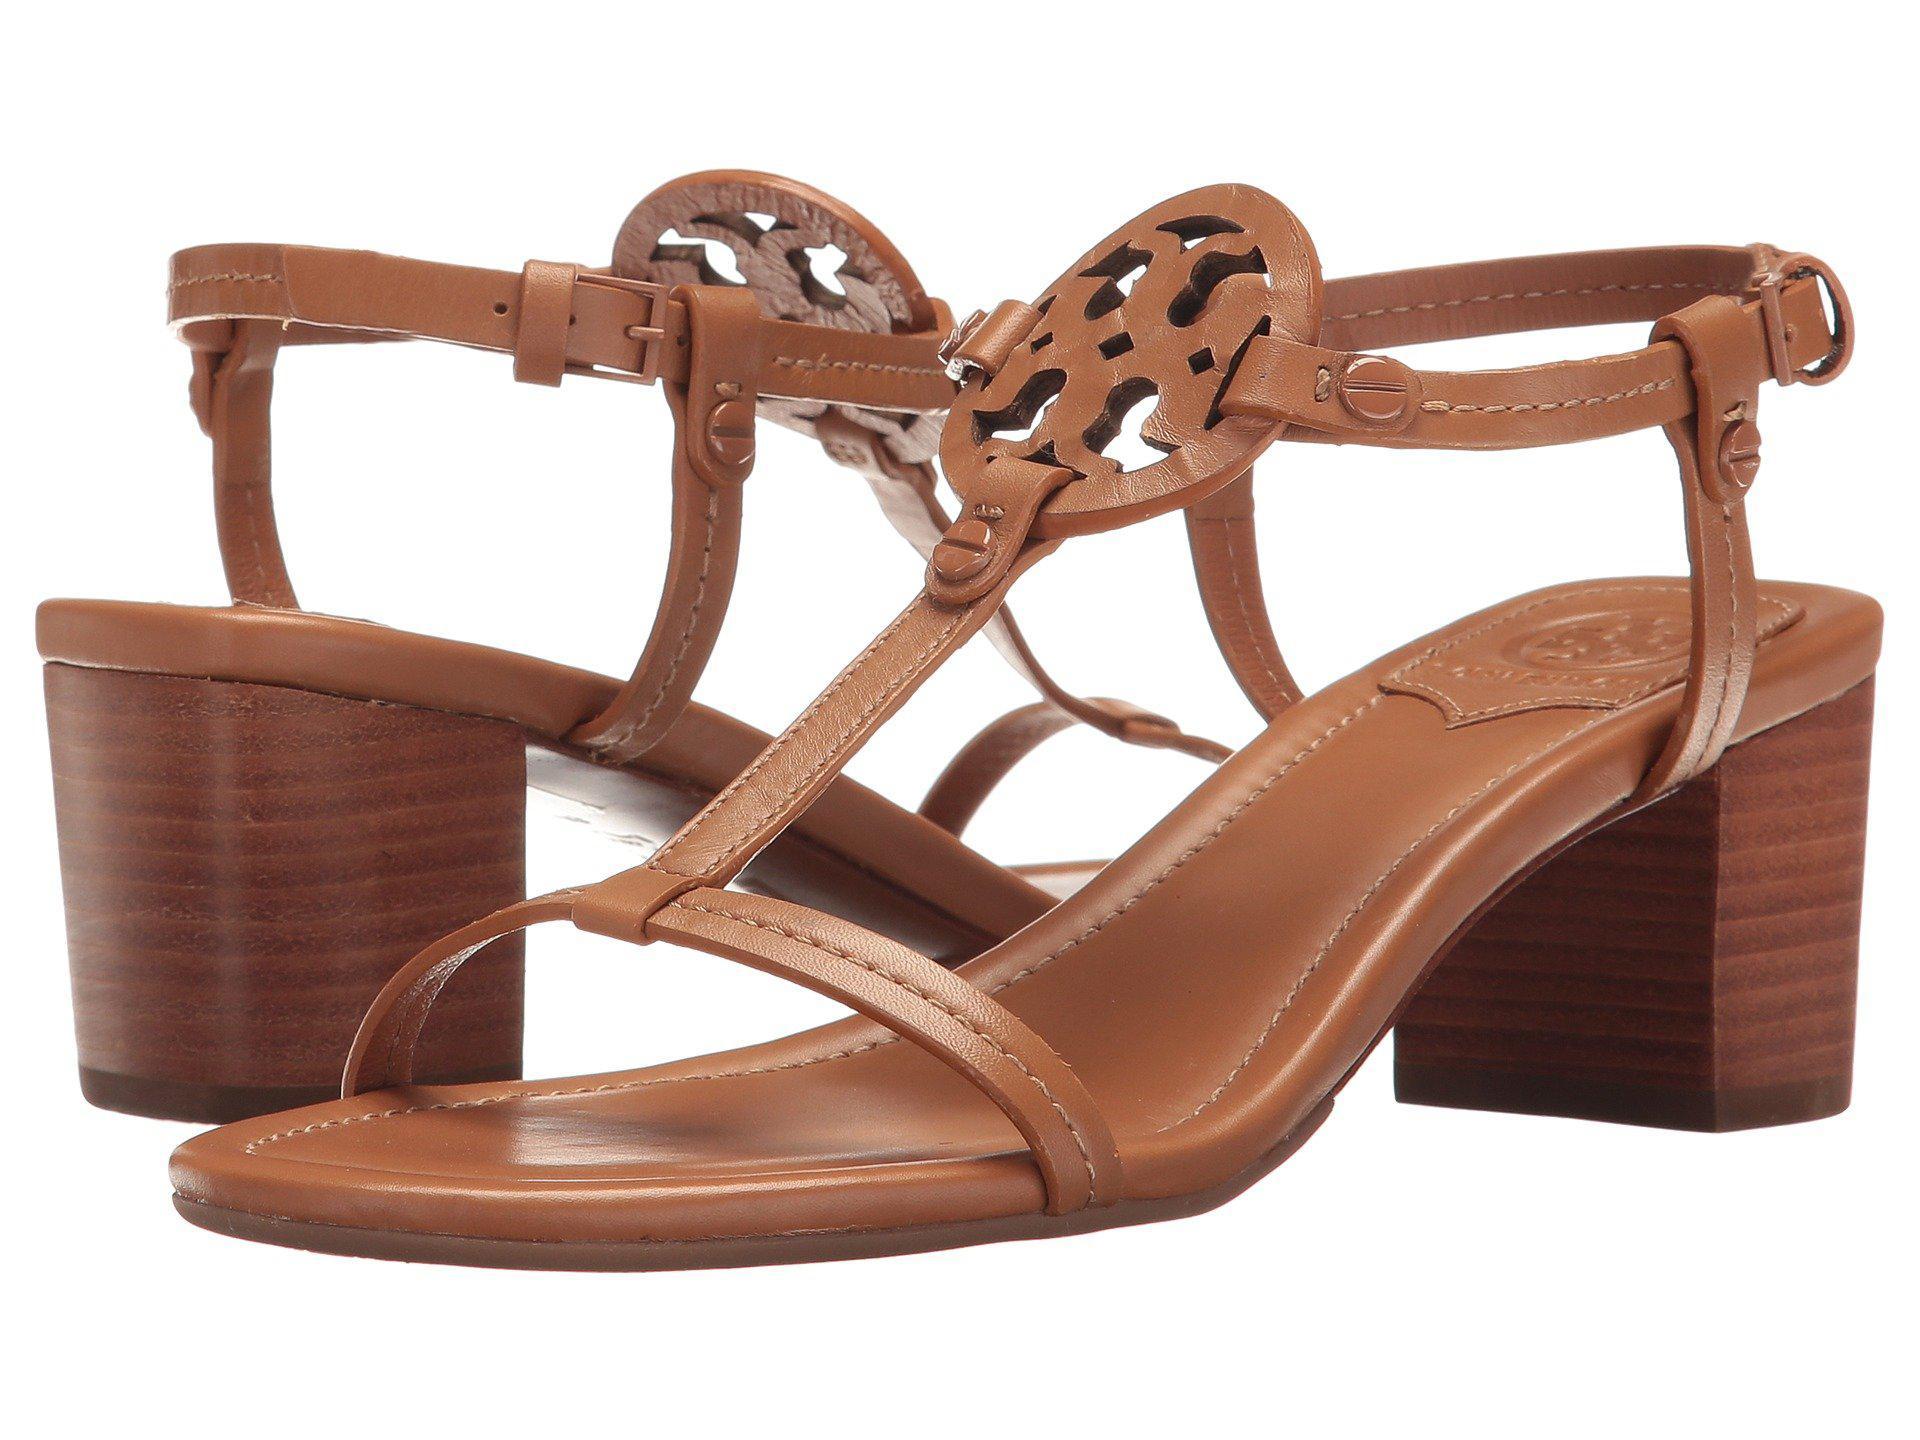 4b21c2d9c02de6 Lyst - Tory Burch Miller 55mm Sandal (royal Tan) Women s Sandals in ...